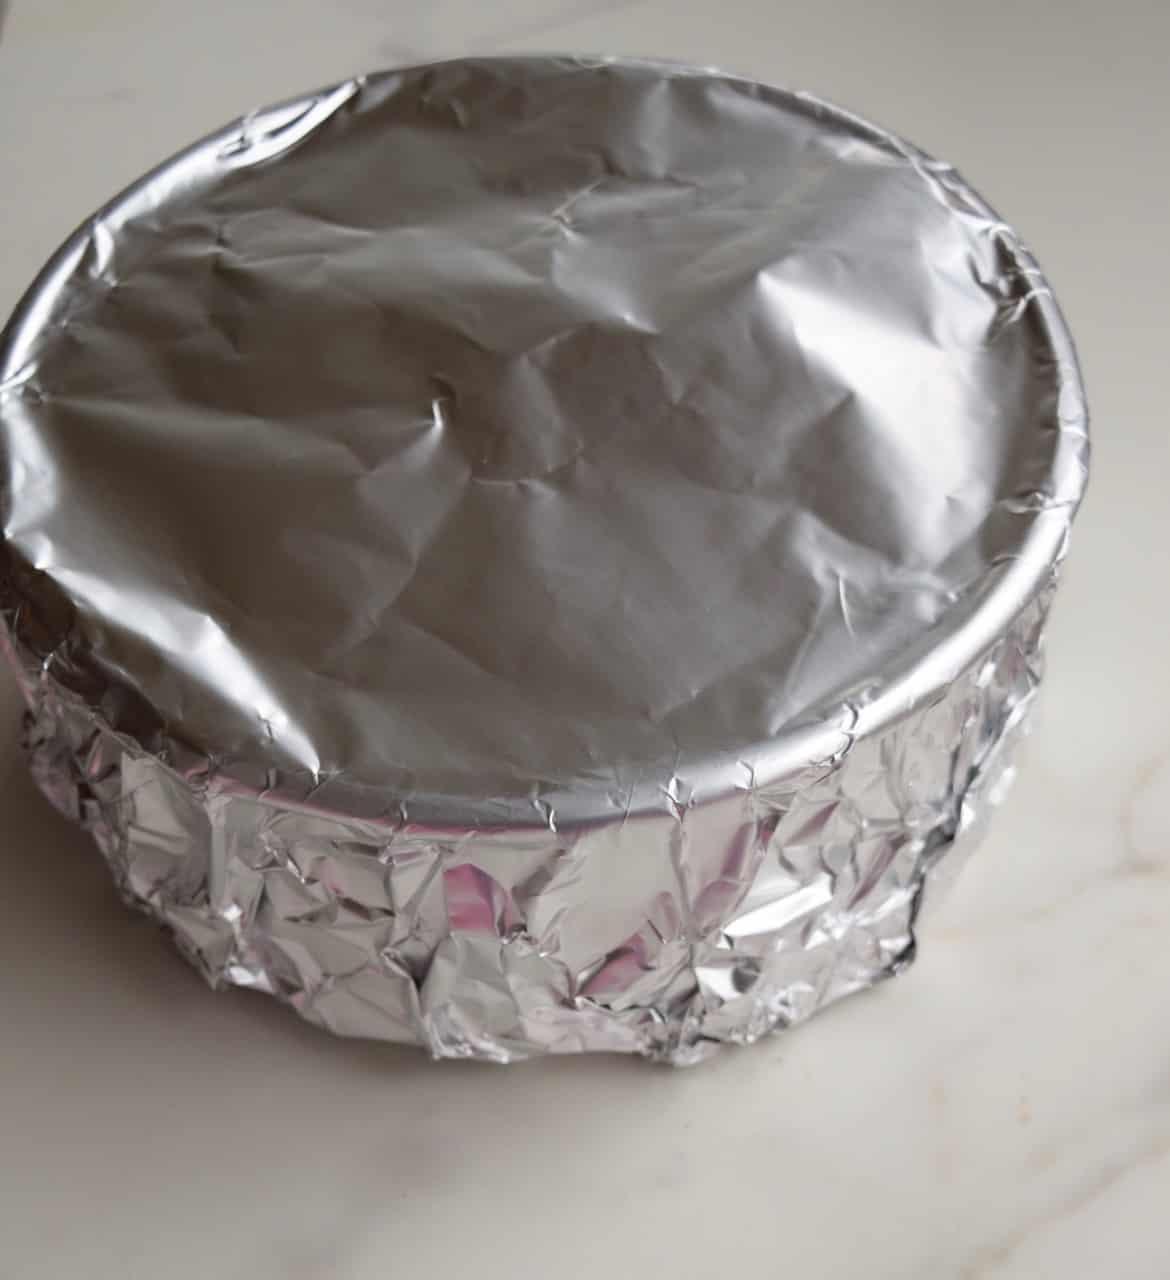 Aluminum foil covering a cake pan